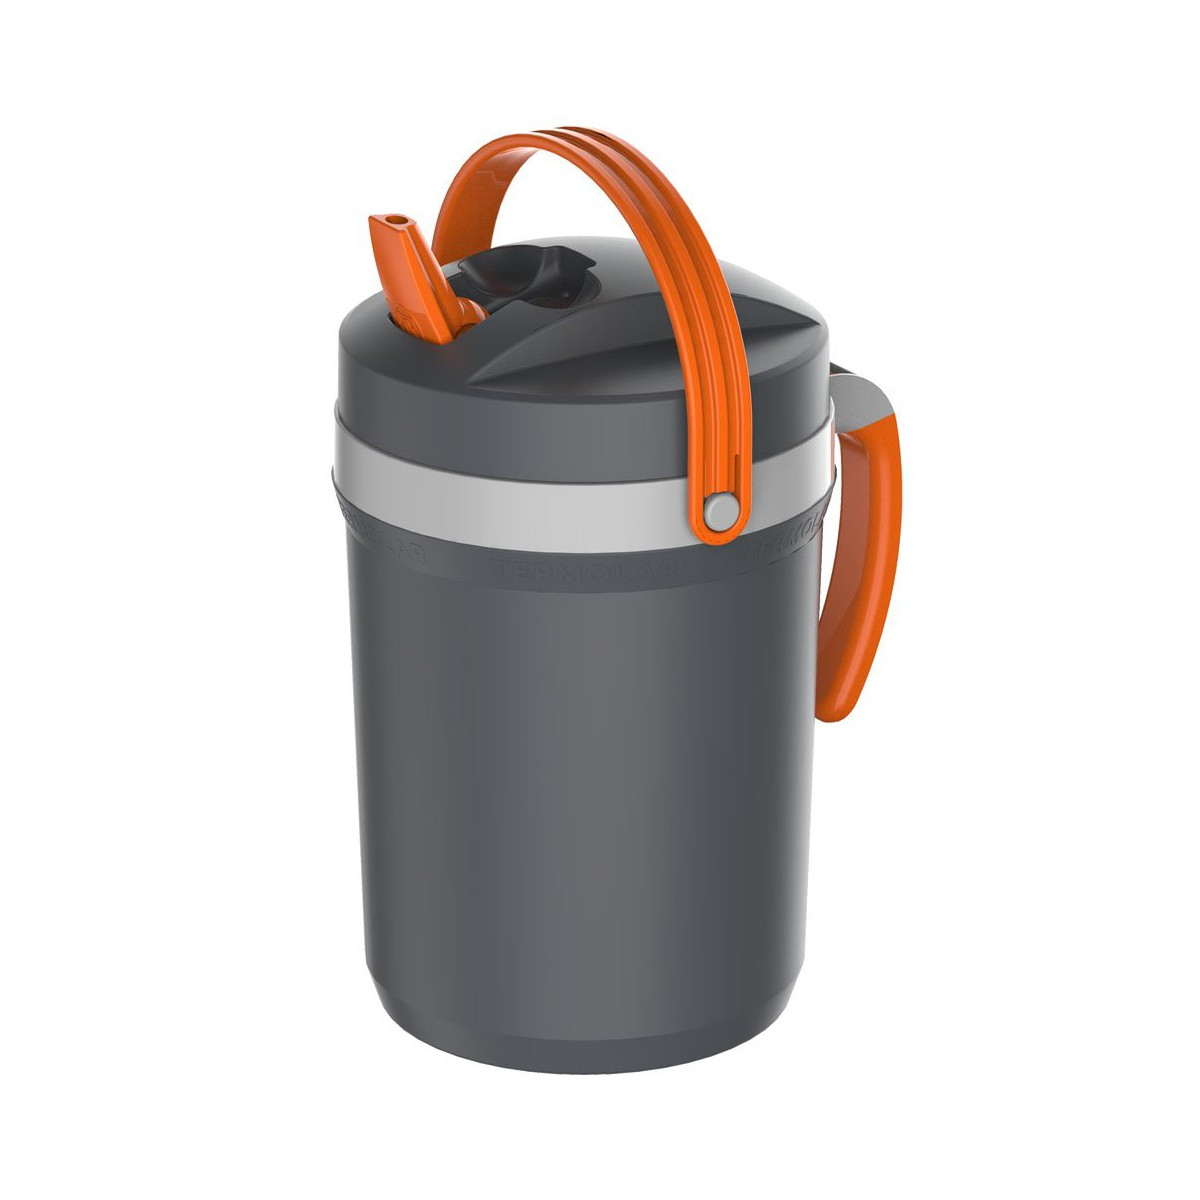 Garrafa Jarra Térmica Fliptop Termolar Cinza 2,5 Litros